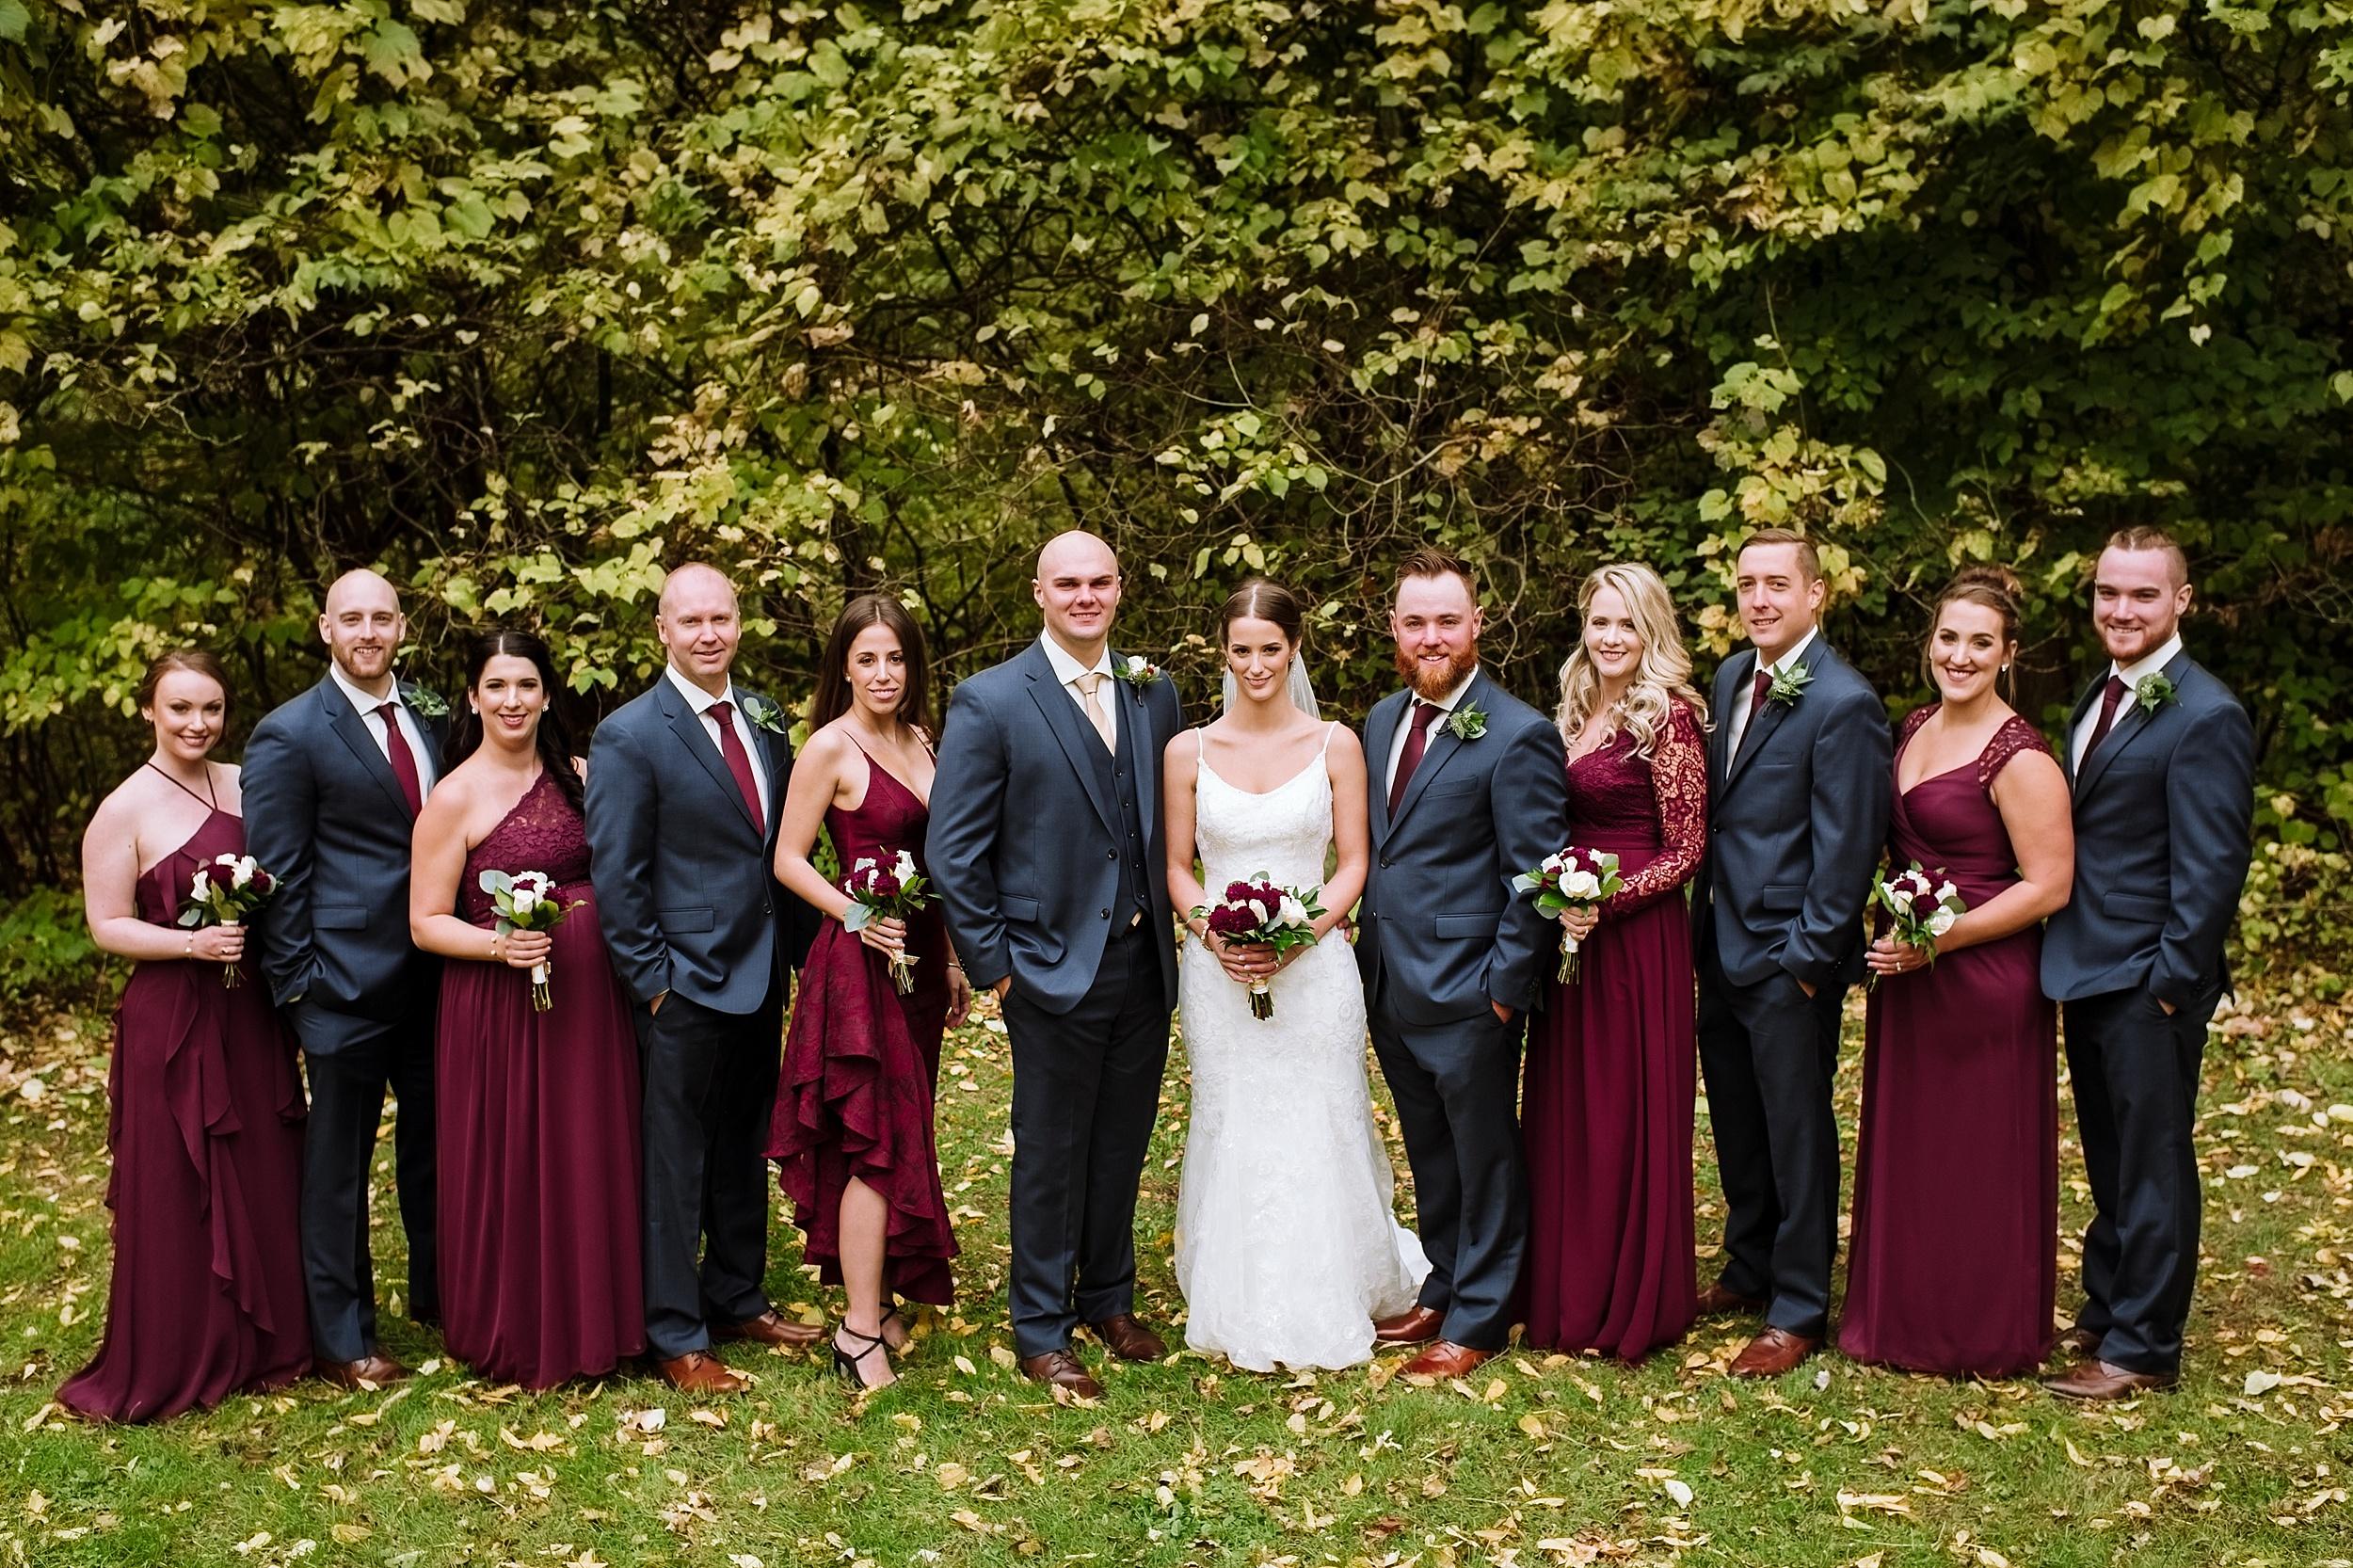 Windemere_Manor_Fall_Wedding_London_Toronto_Wedding_Photographer_0026.jpg